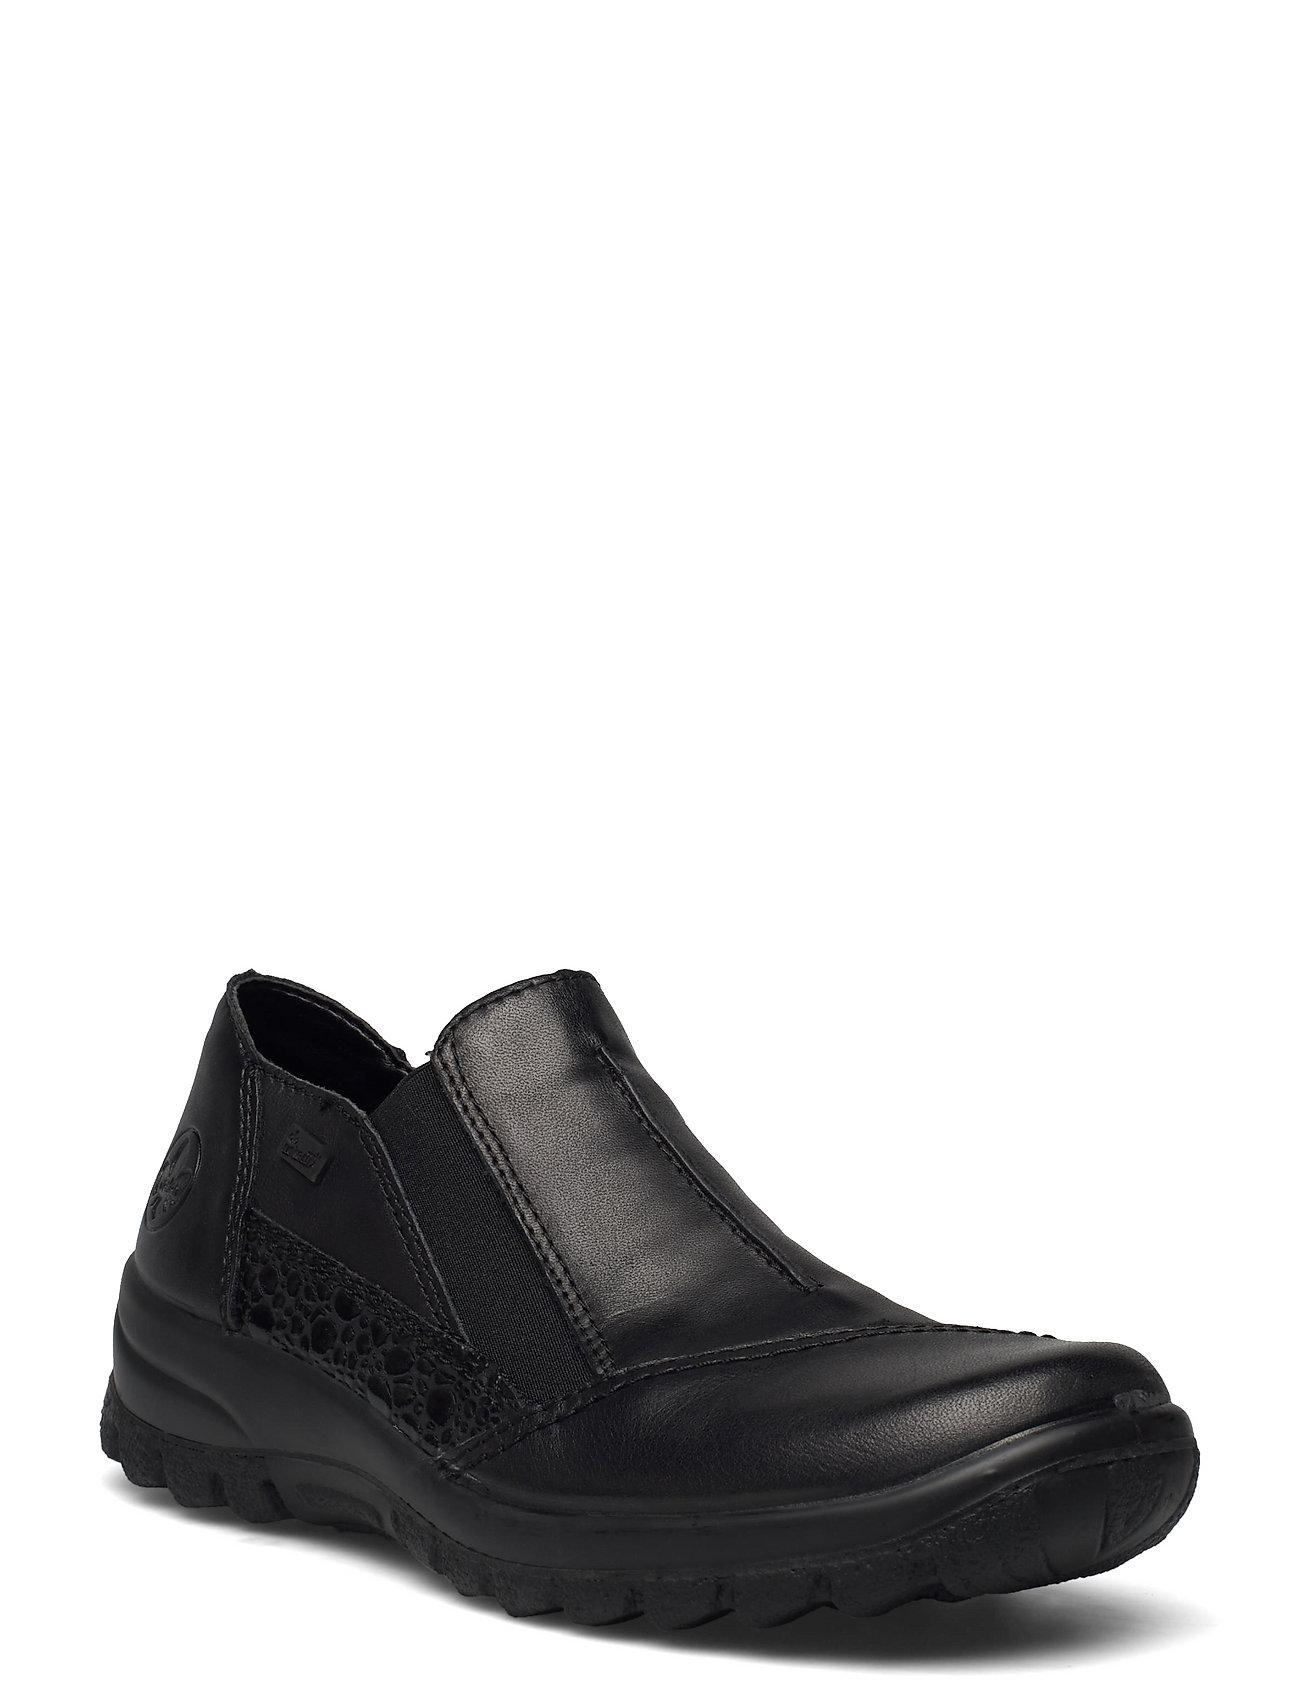 L7178-00 Sneakers Sort Rieker